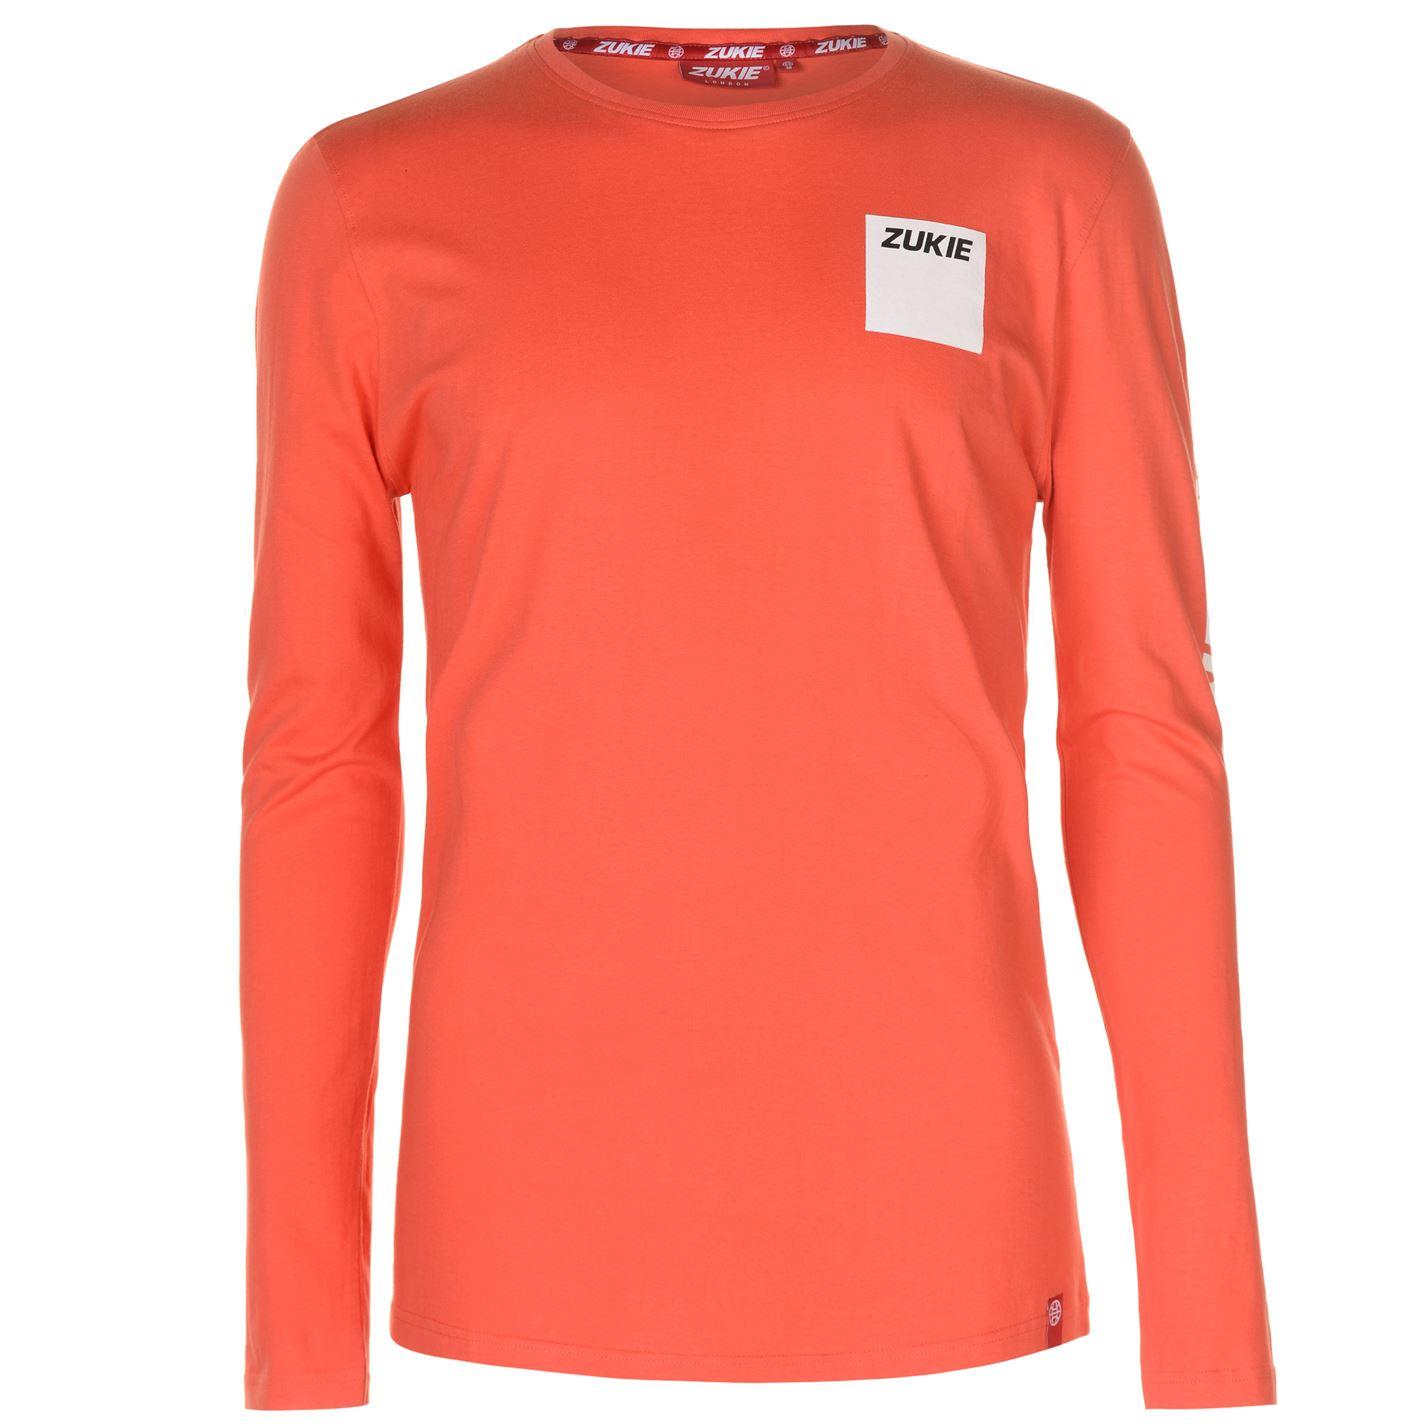 Triko Zukie Long Sleeve T Shirt pánské